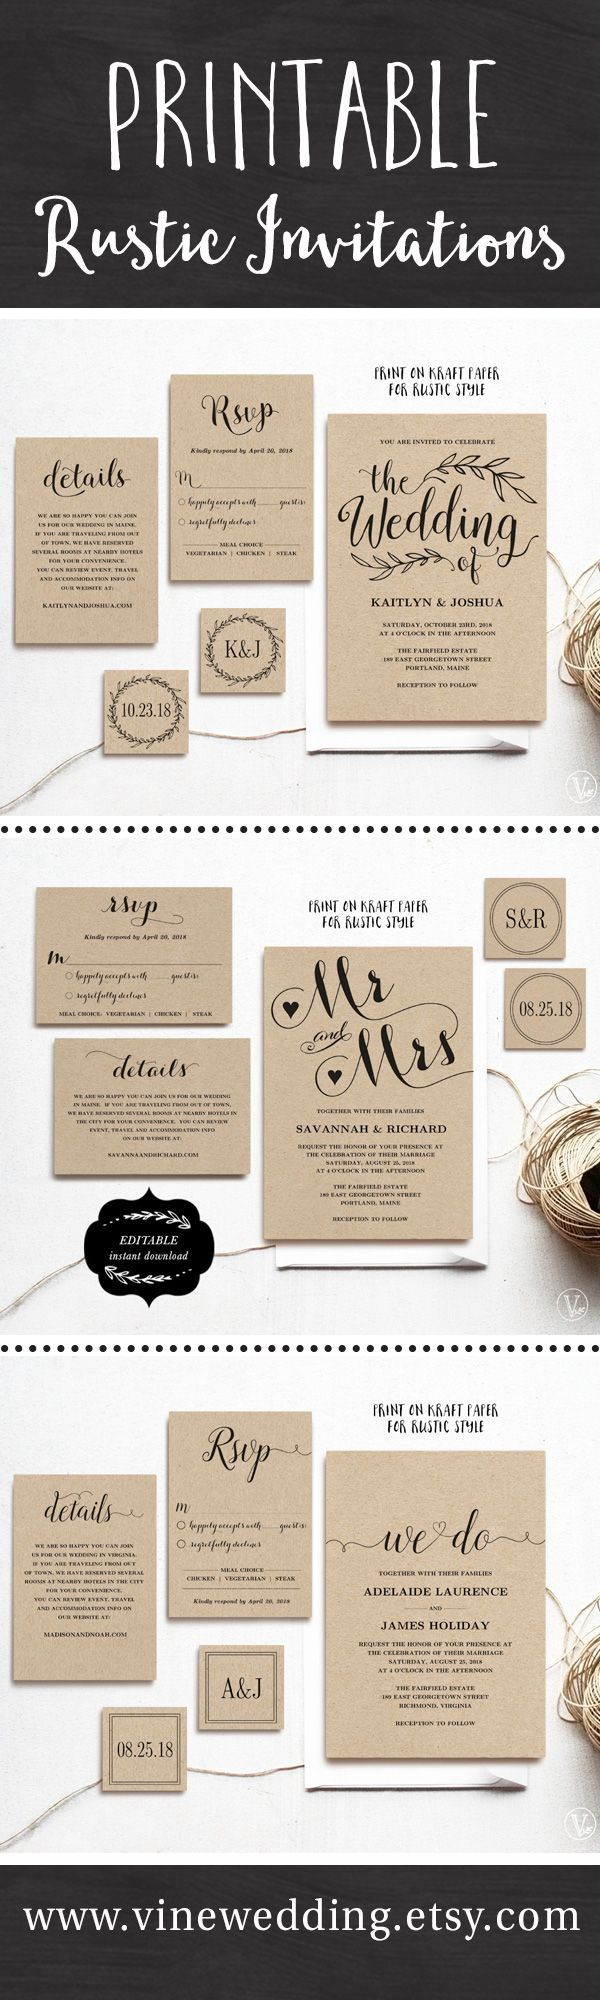 wedding invitation diy kits uk%0A call center resume samples